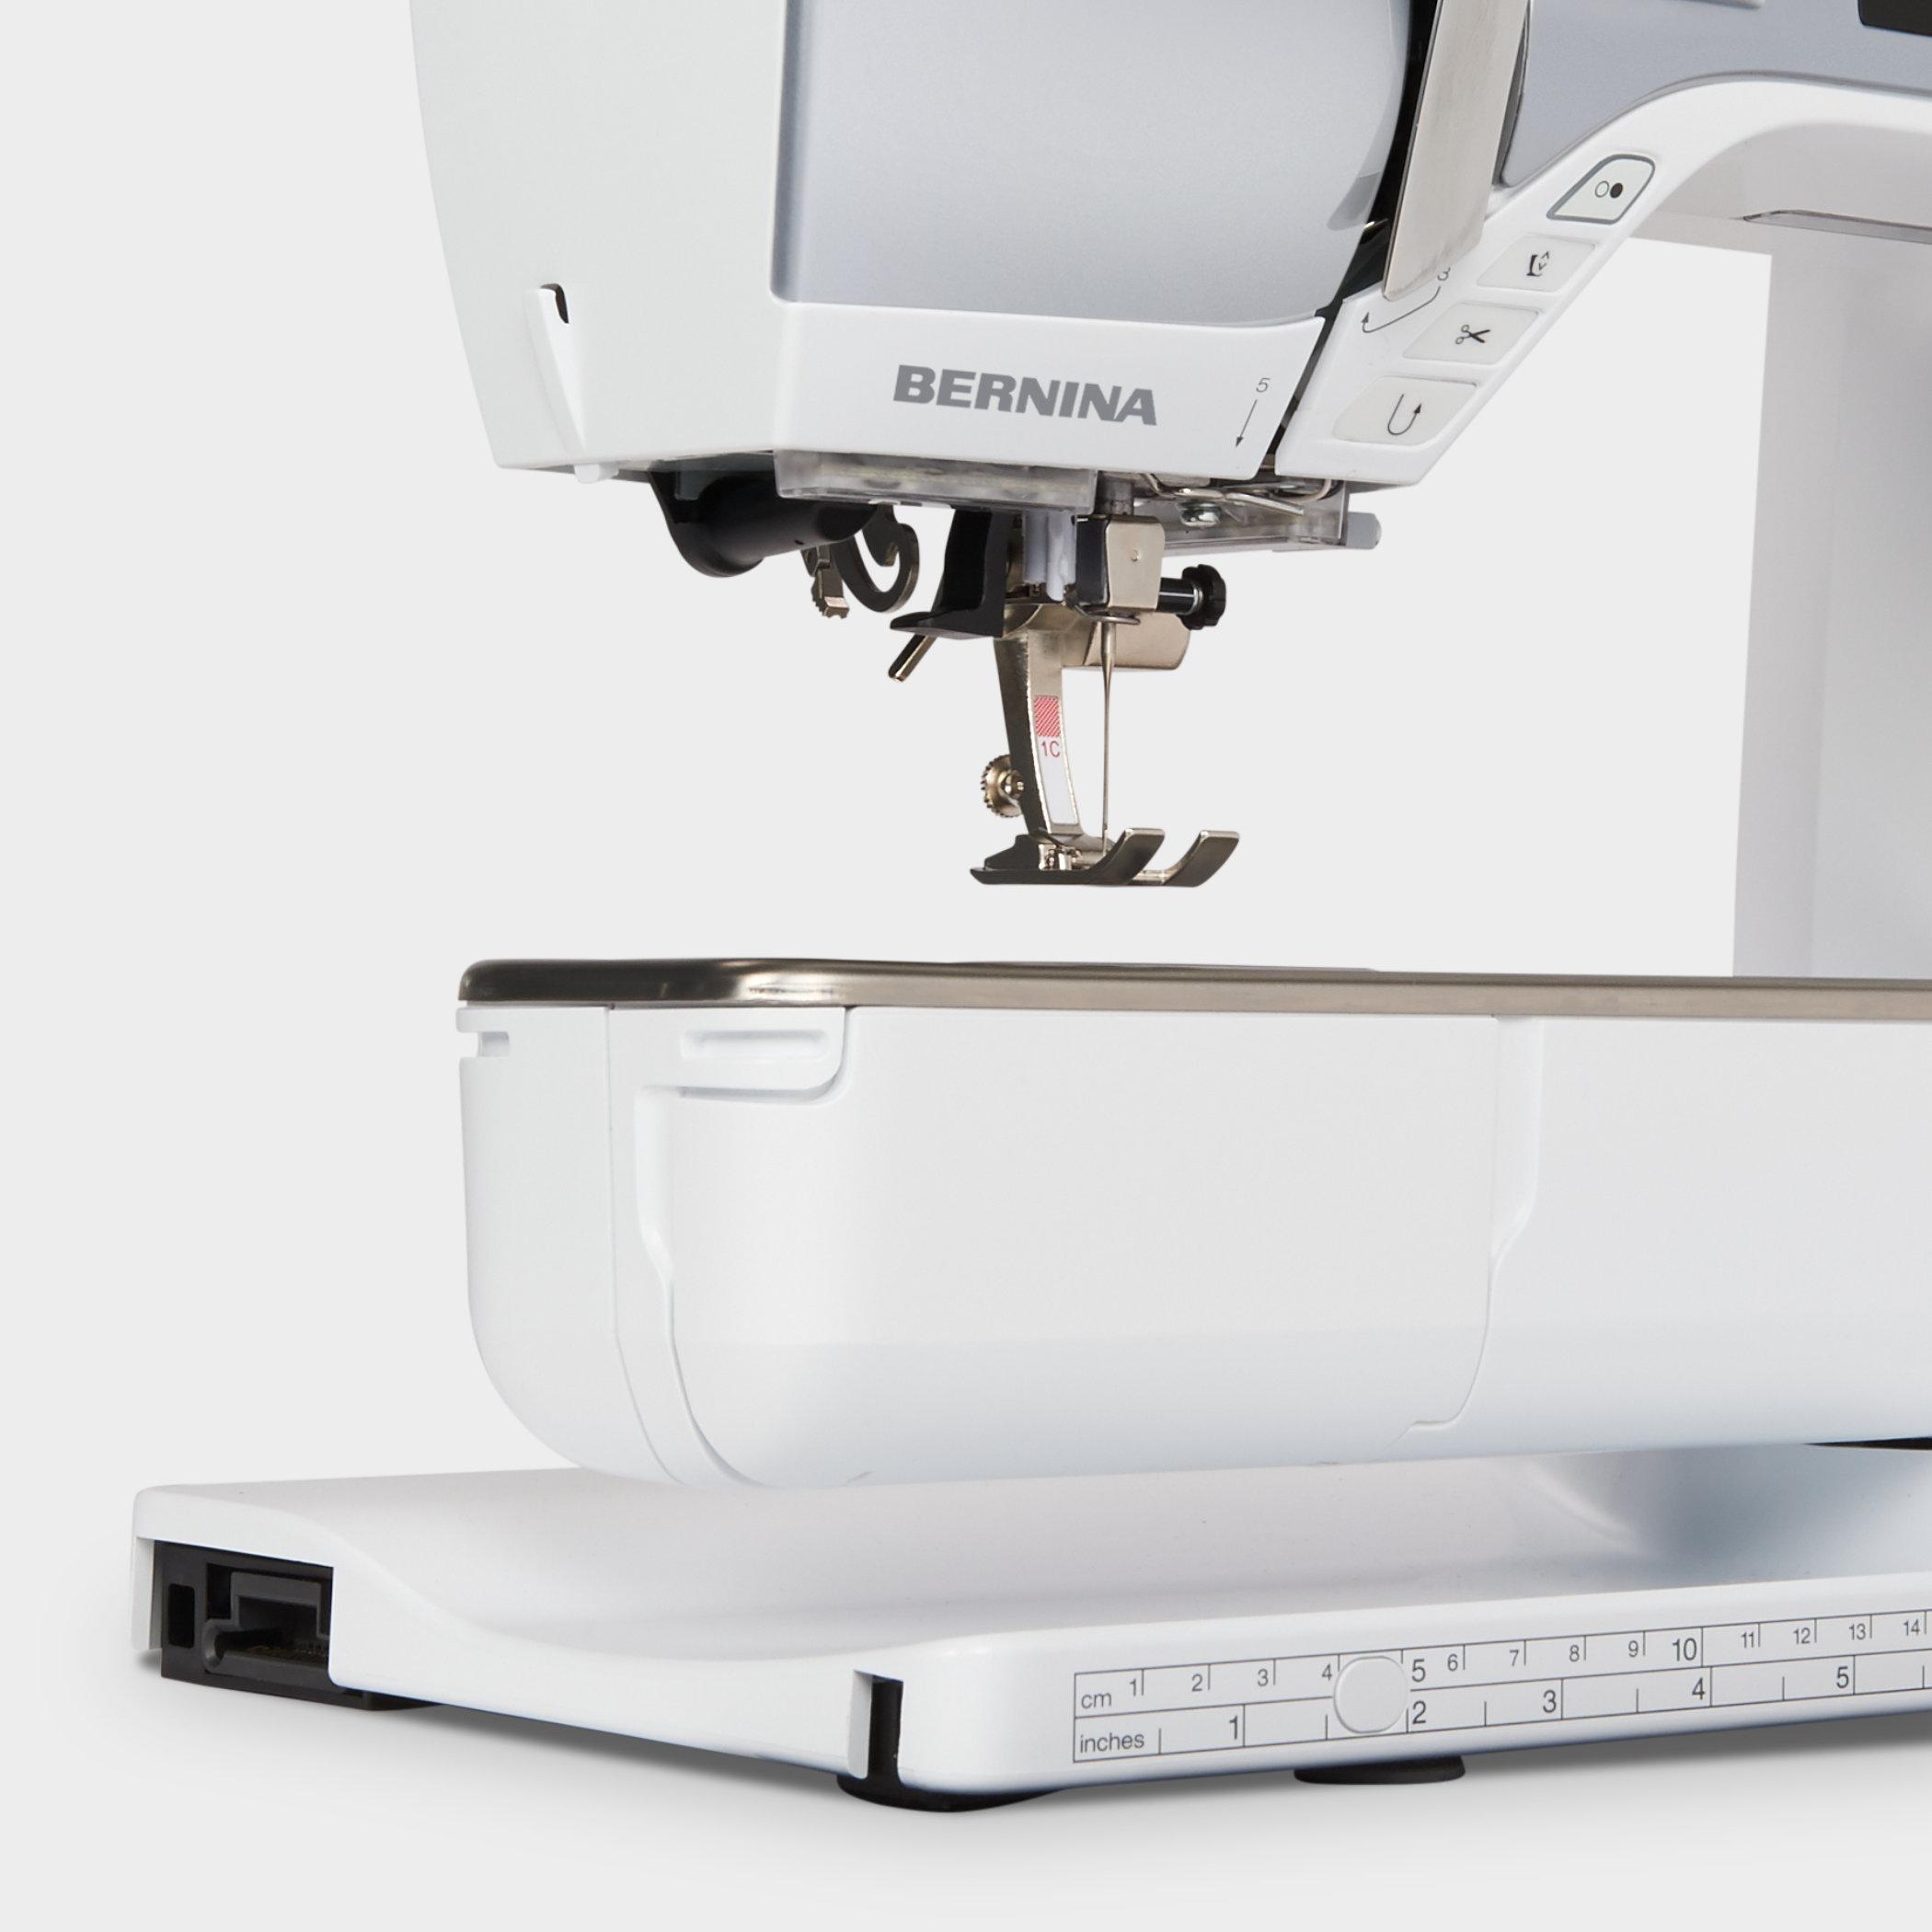 BERNINA-570QE-Feature-Freiarm